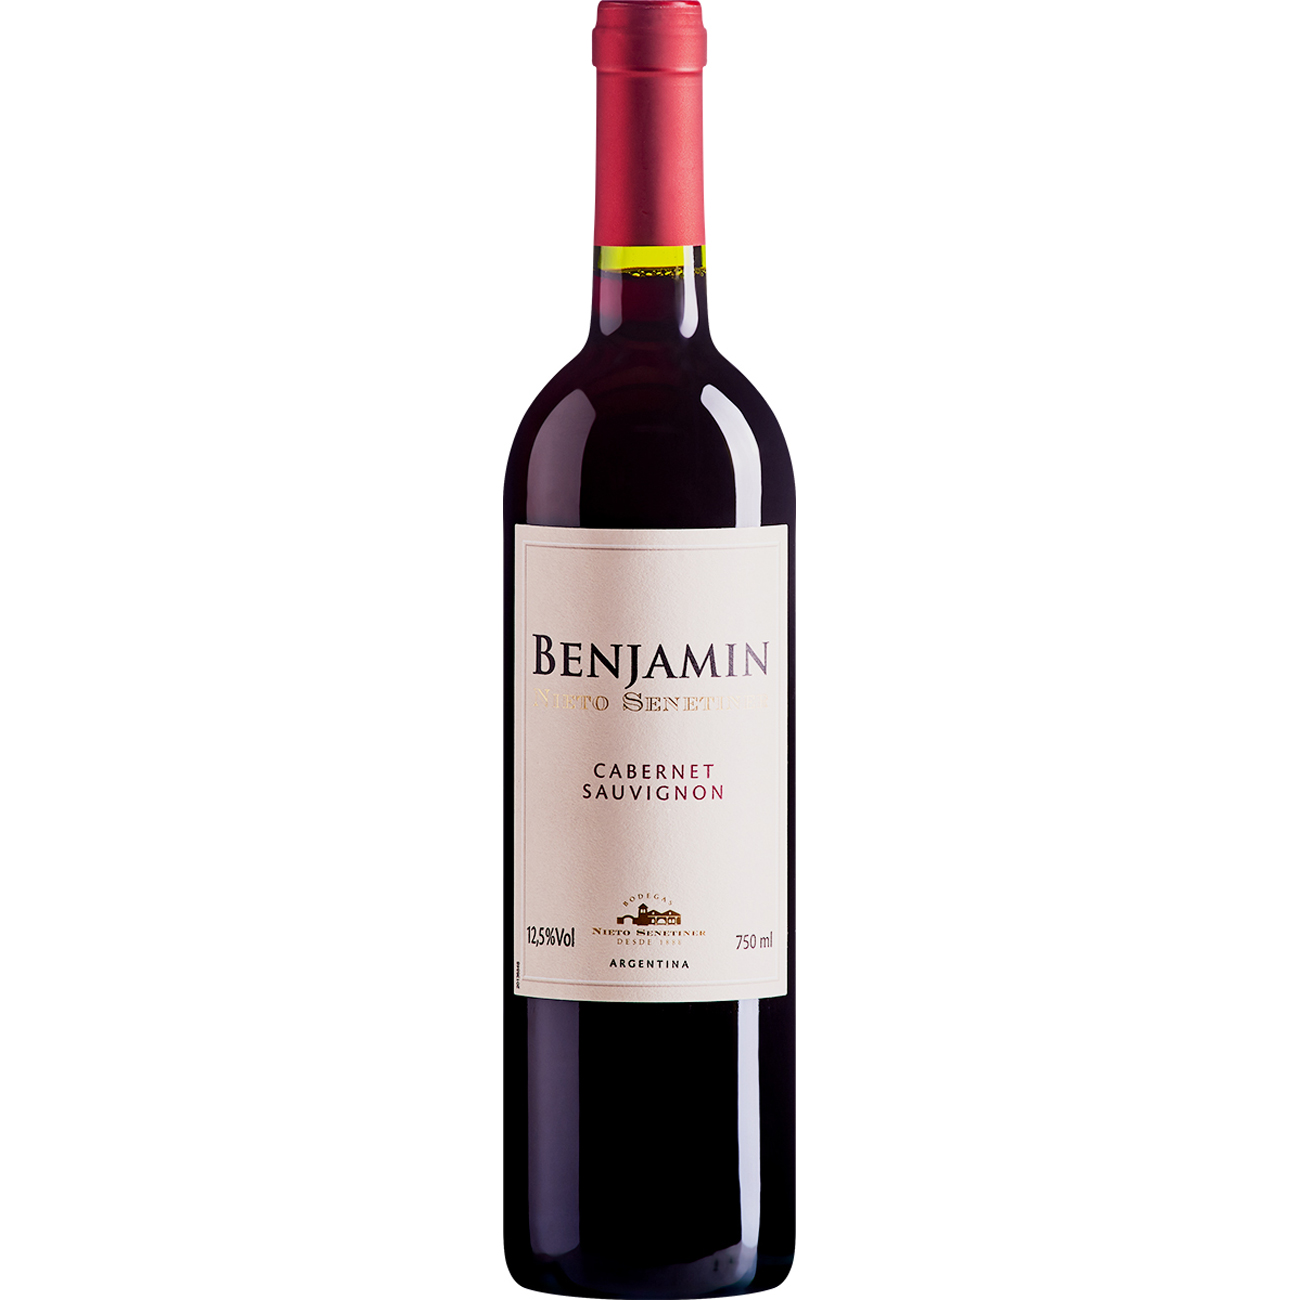 Vinho Argentino Benjamin Nieto Senetiner Cabernet Sauvignon Tinto 750ml